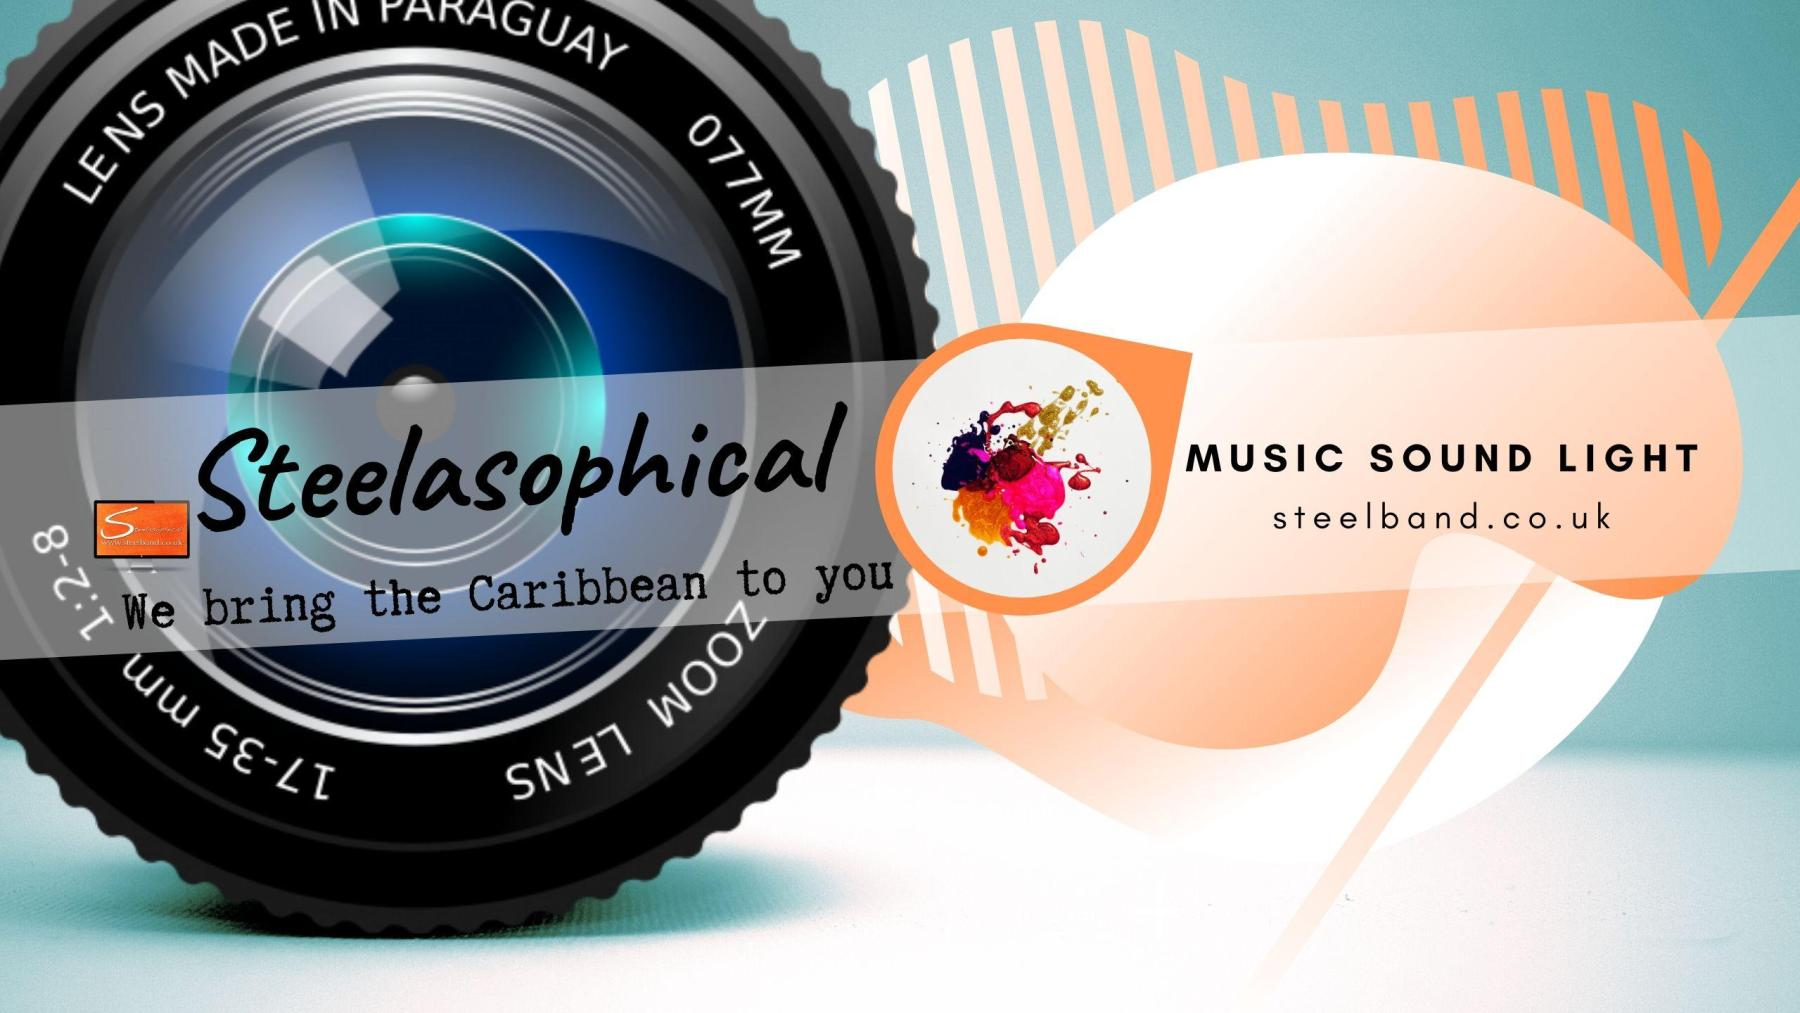 Steelasophical SteelBand for Hire UK steelpans Music 01er